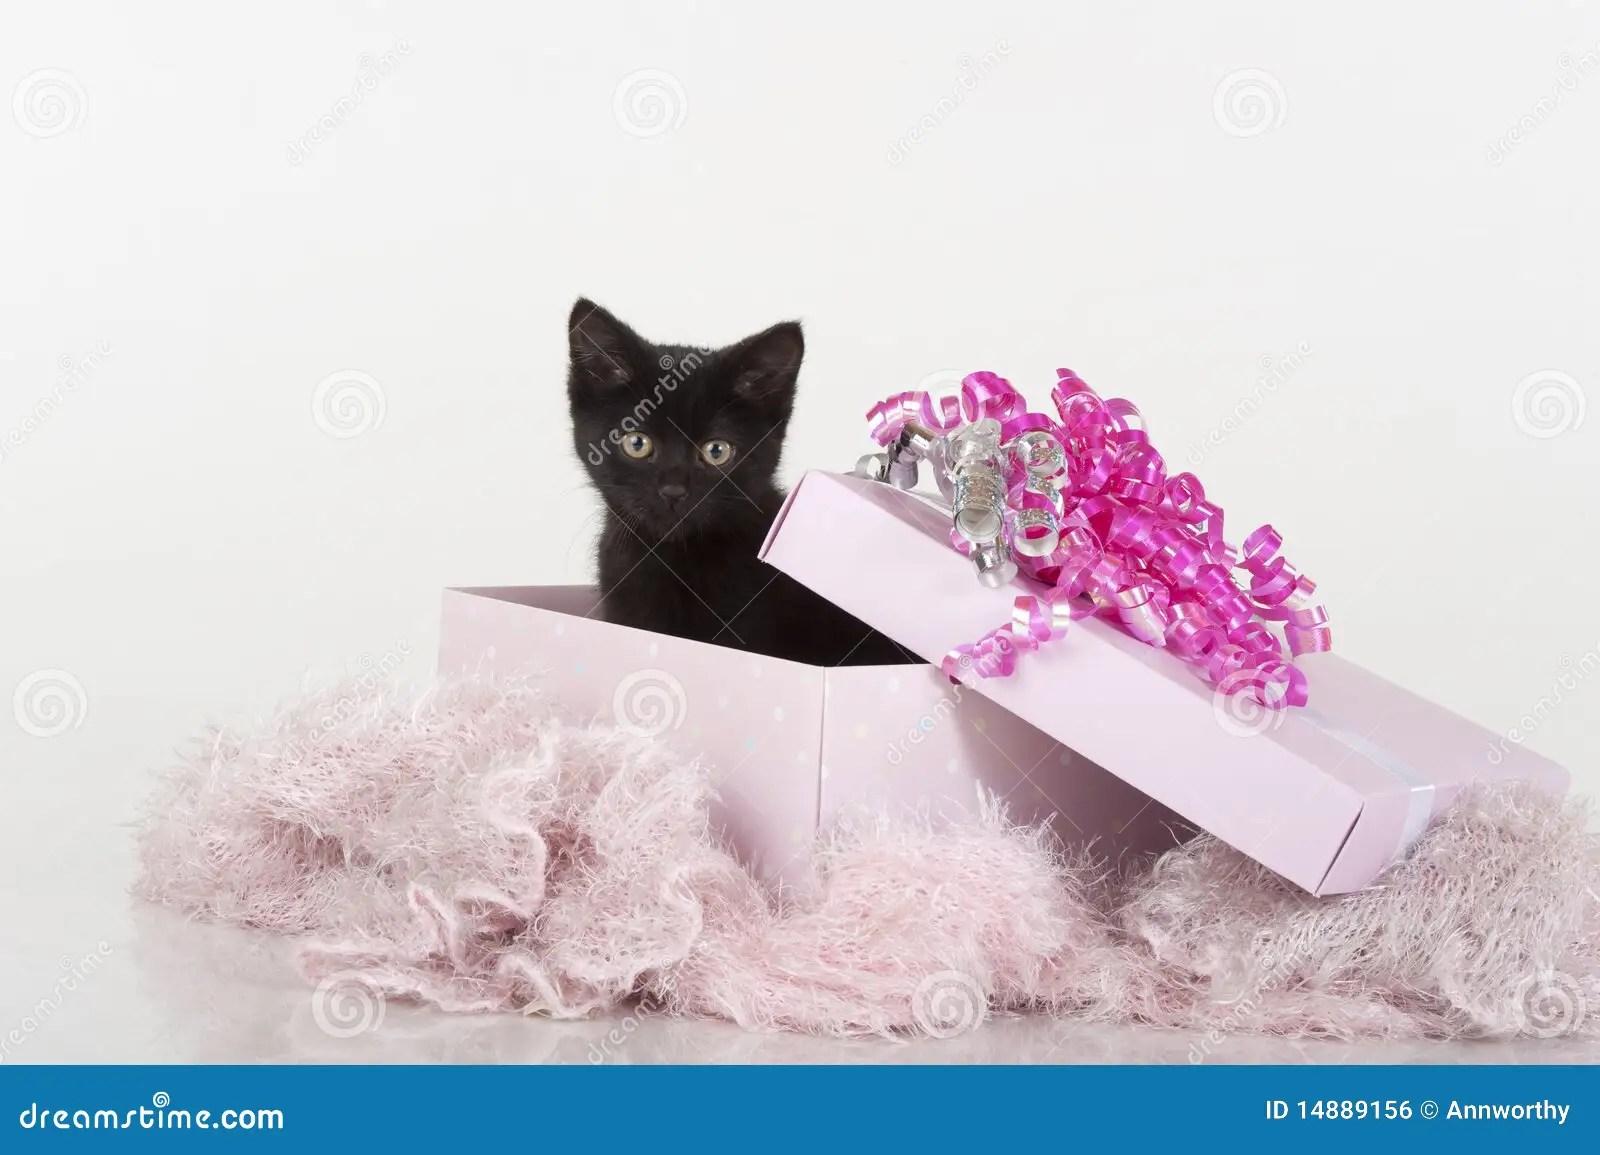 Background Happy Kitten Birthday